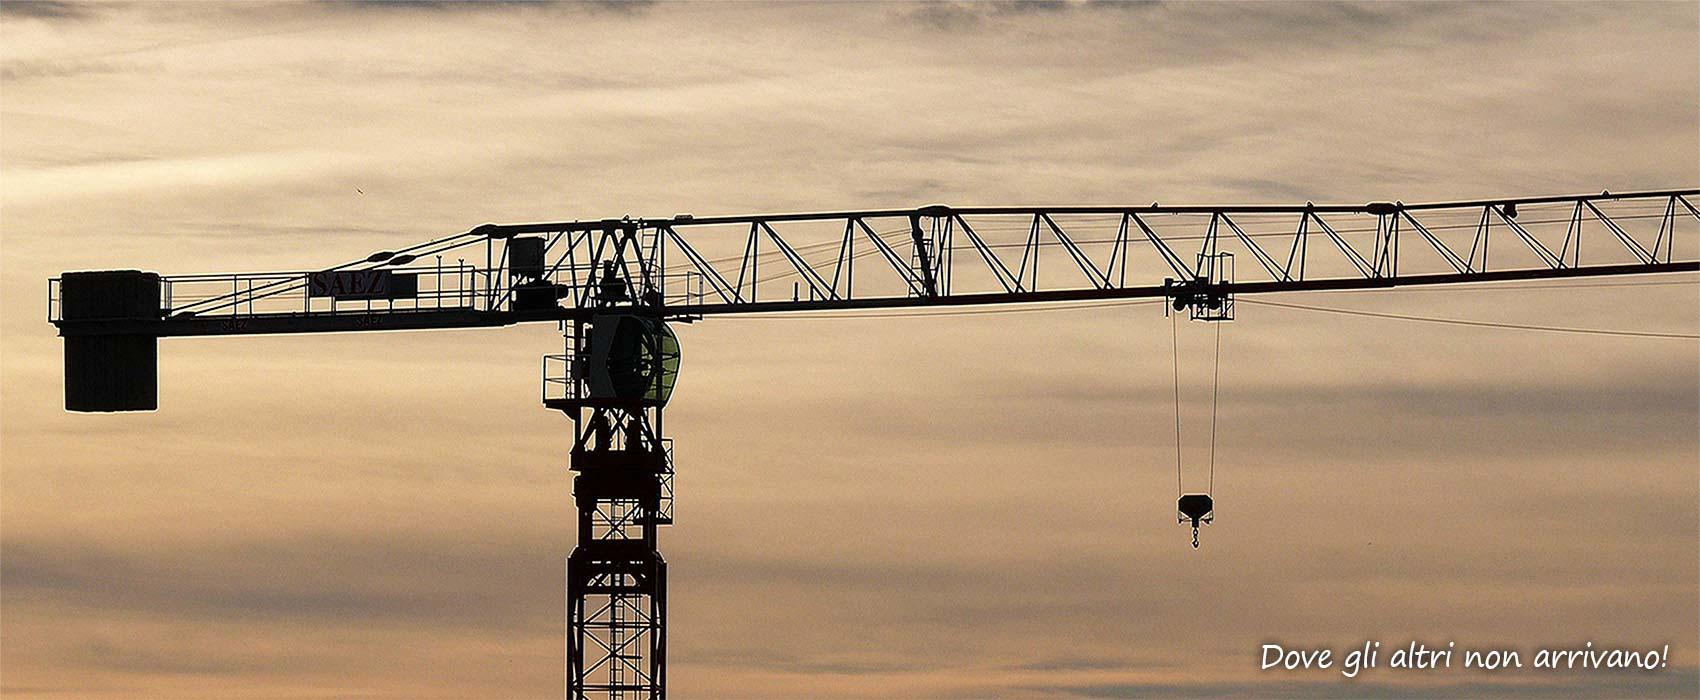 CONSTRUCTION CRANE SALE AND RENTAL